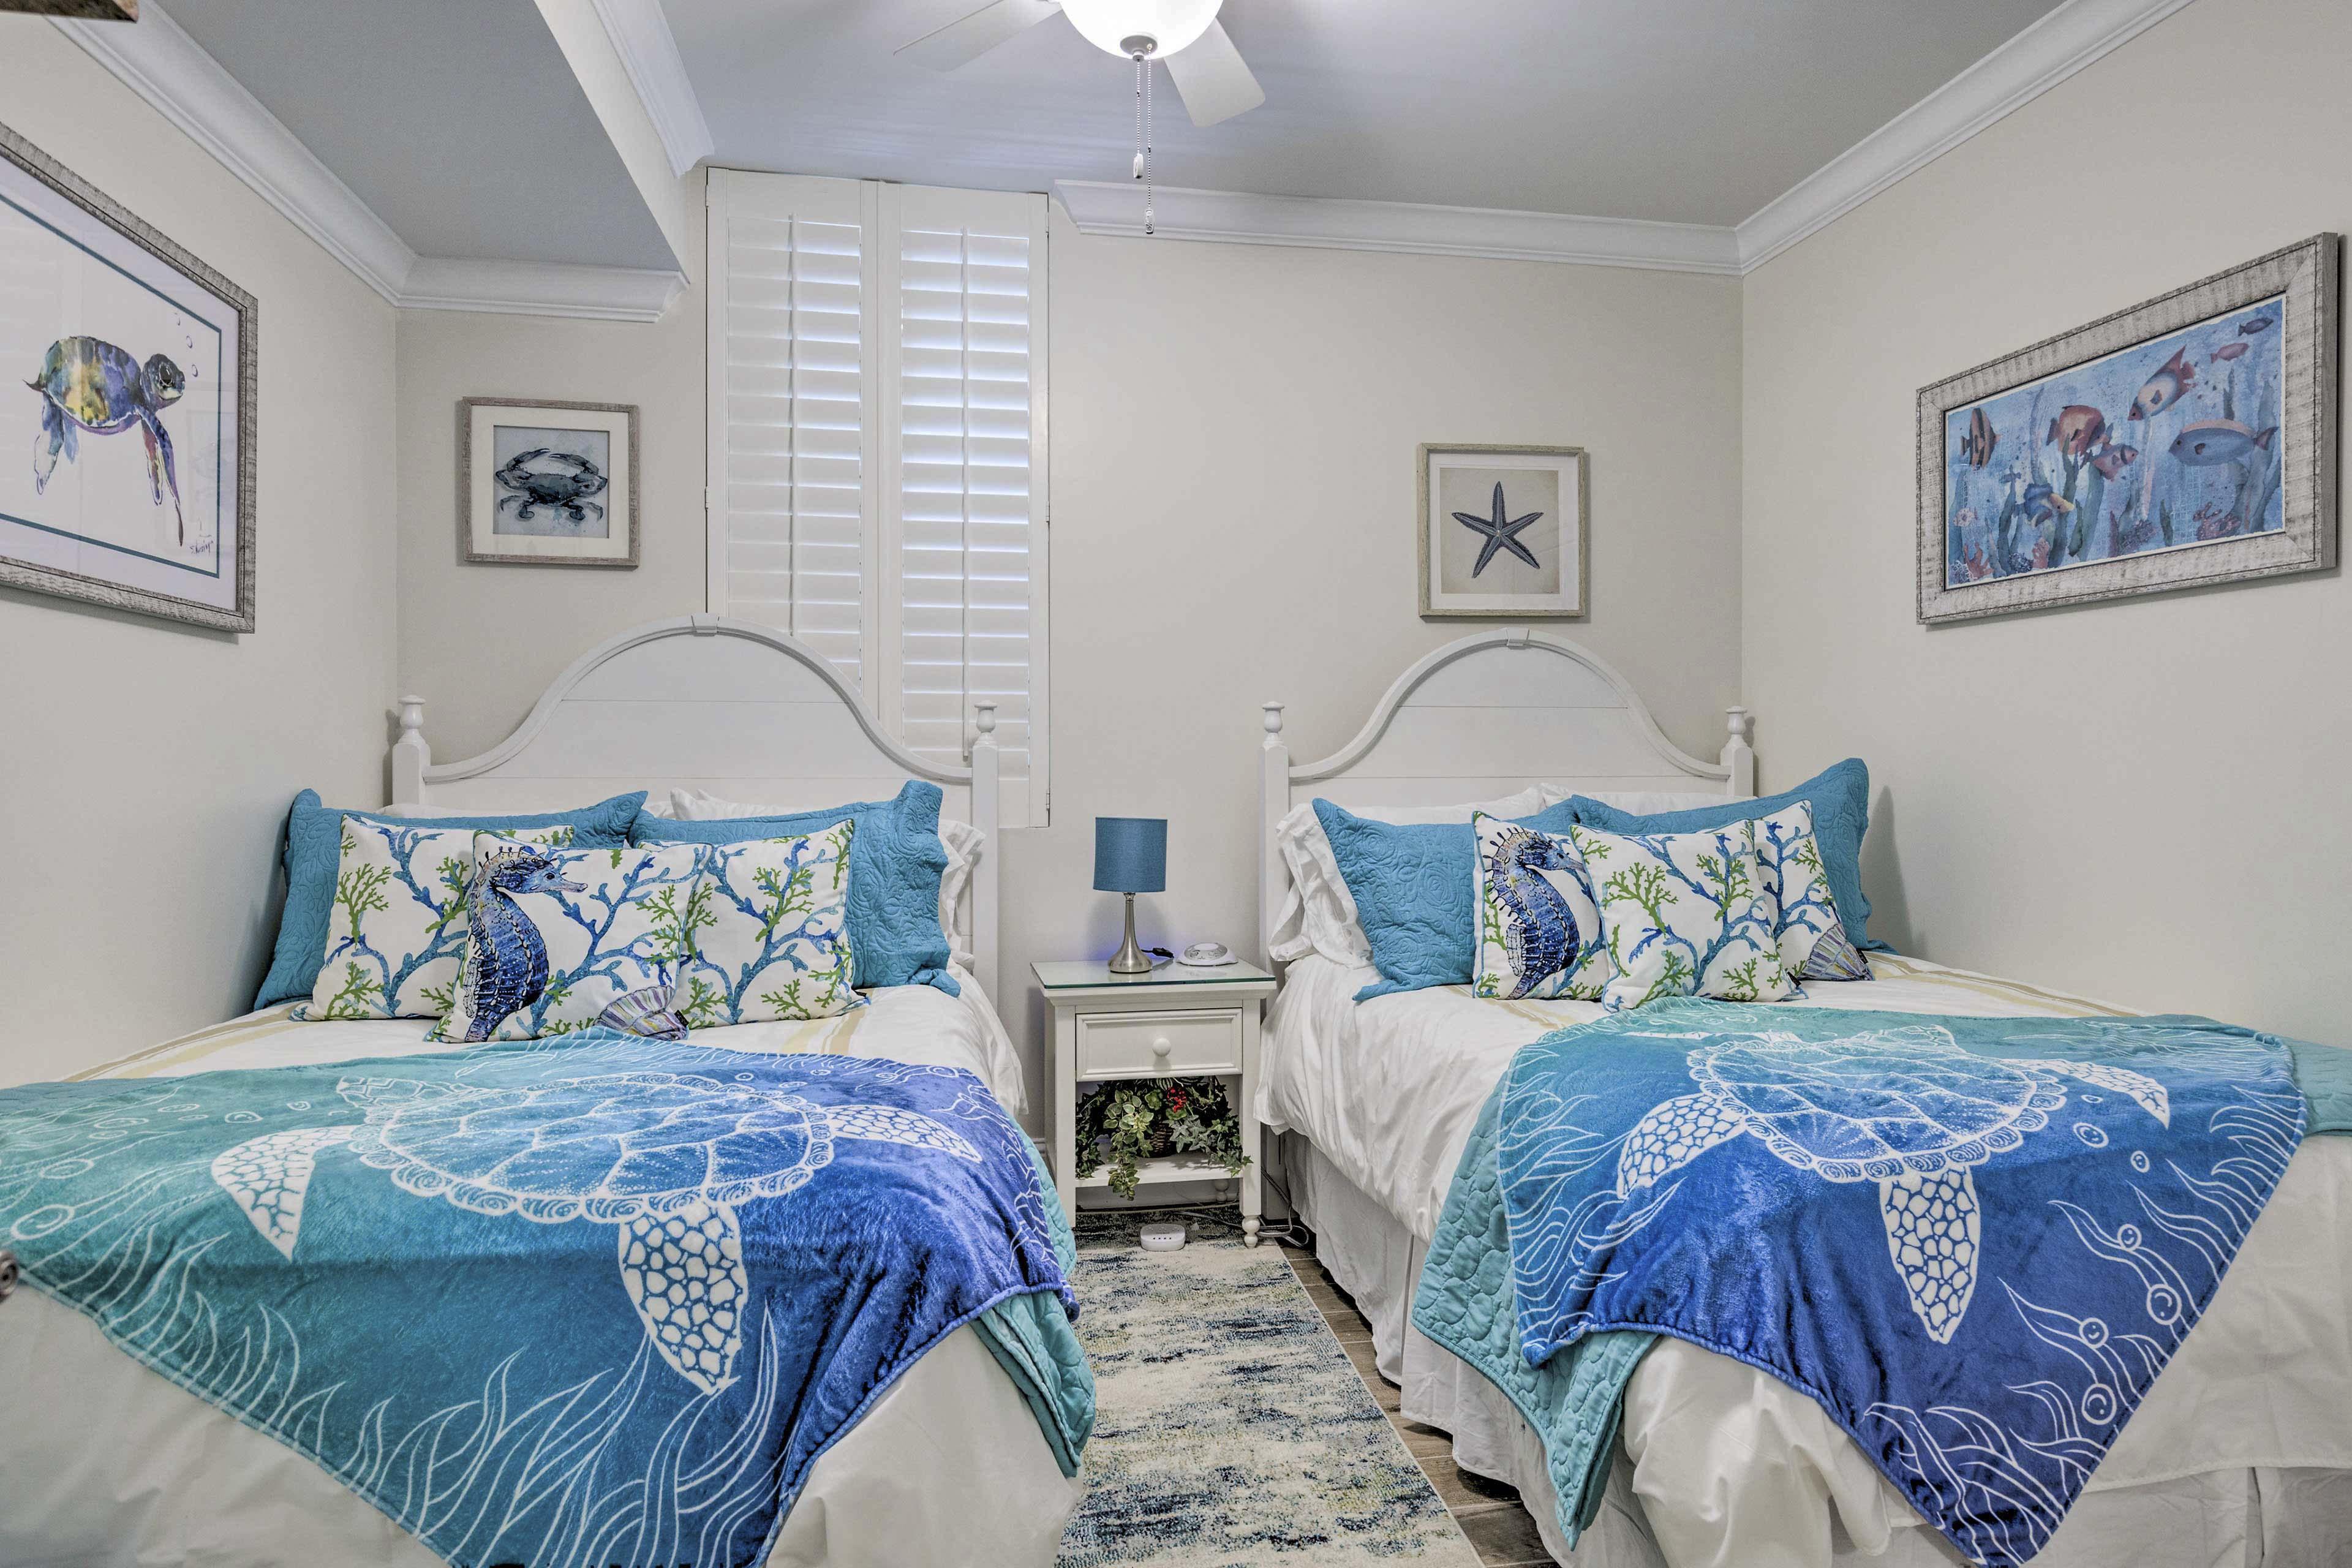 Bedroom 3 | 2 Full Beds | Linens Provided